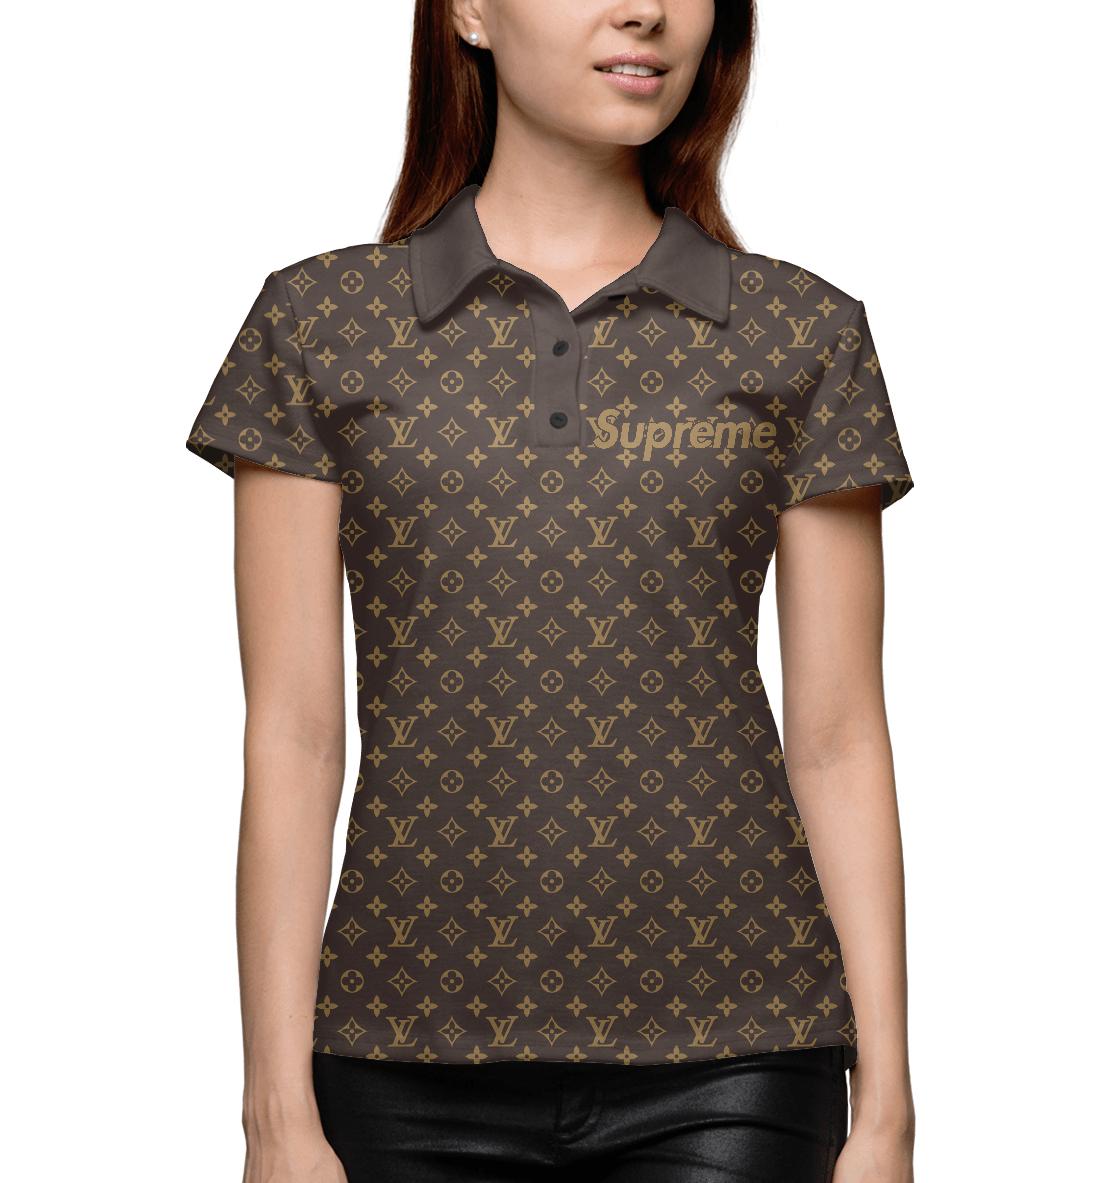 Купить Supreme Louis Vuitton, Printbar, Поло, SPR-676676-pol-1